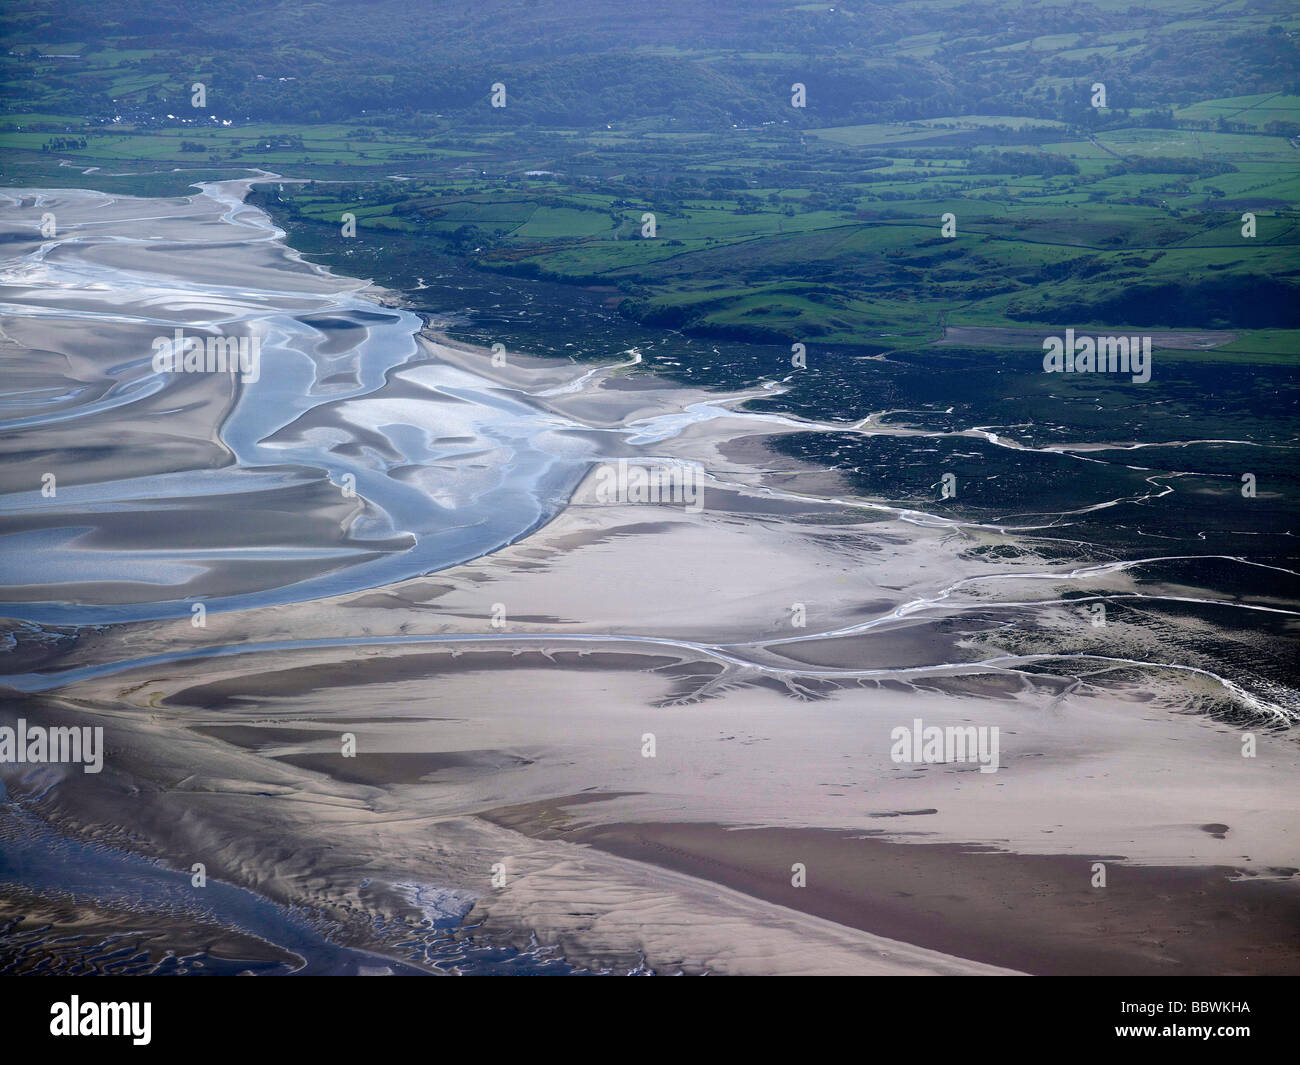 The Estuary at Pothmadoc, North Wales Coast - Stock Image